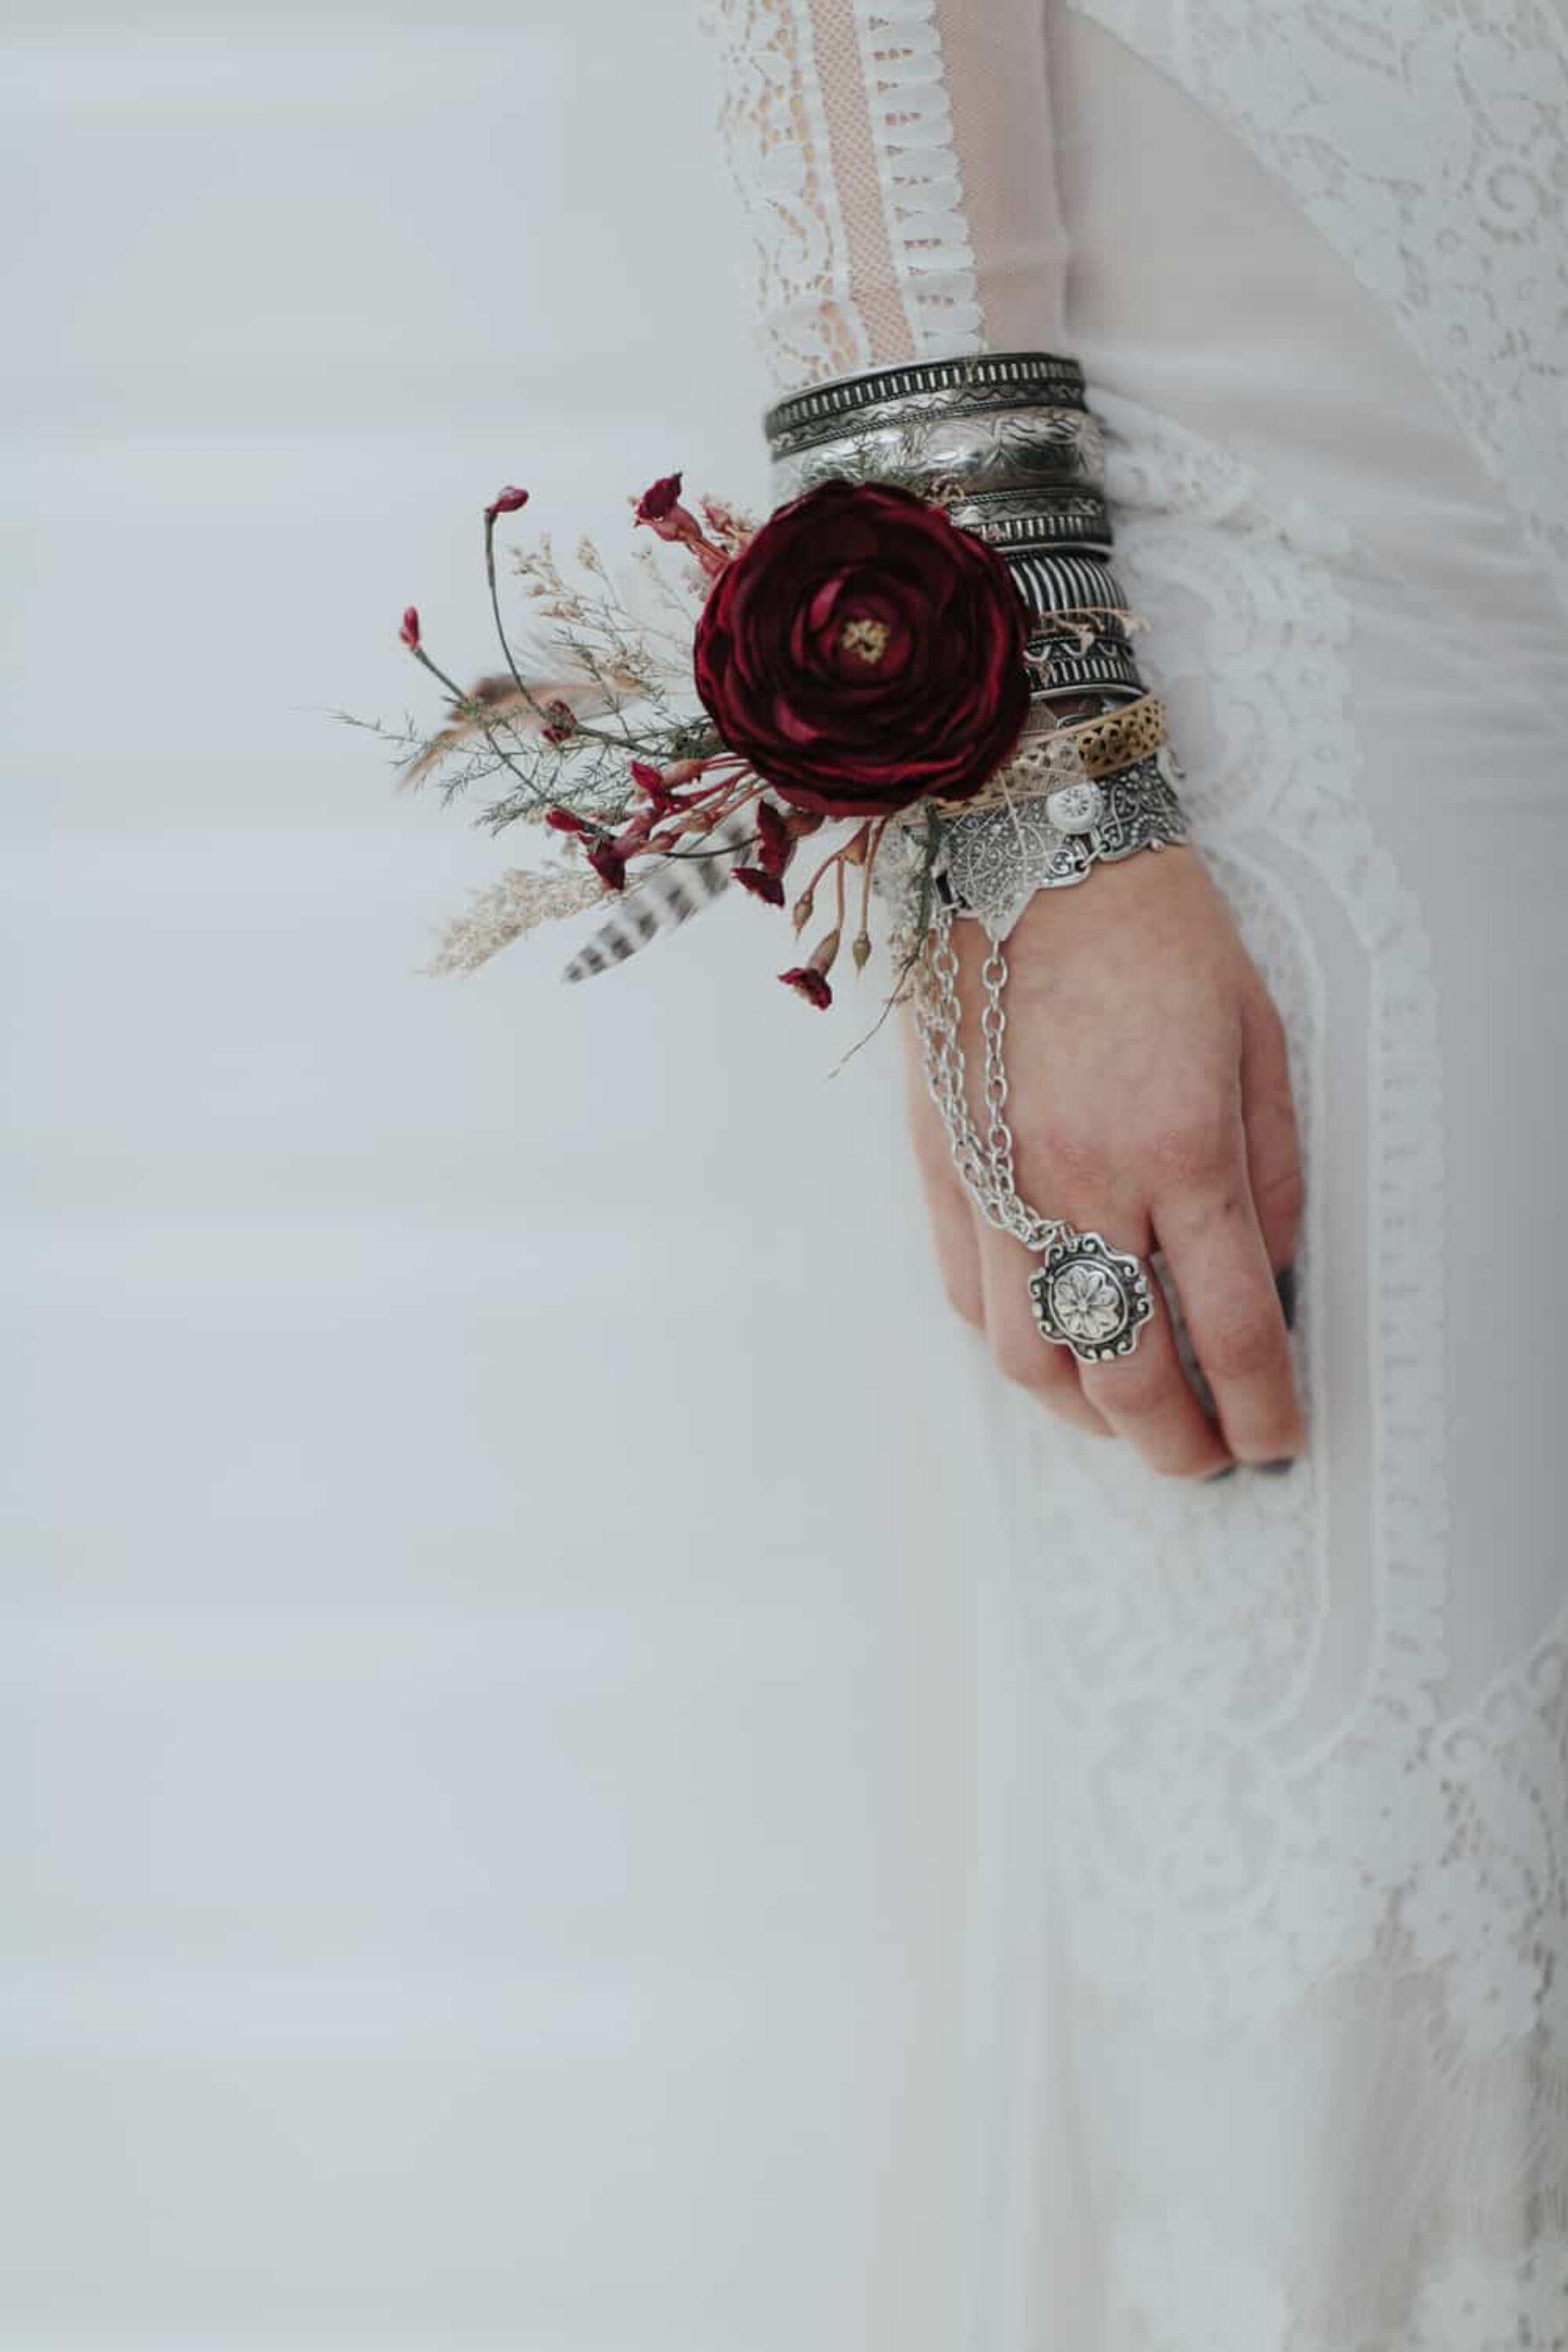 boho bride with wrist corsage